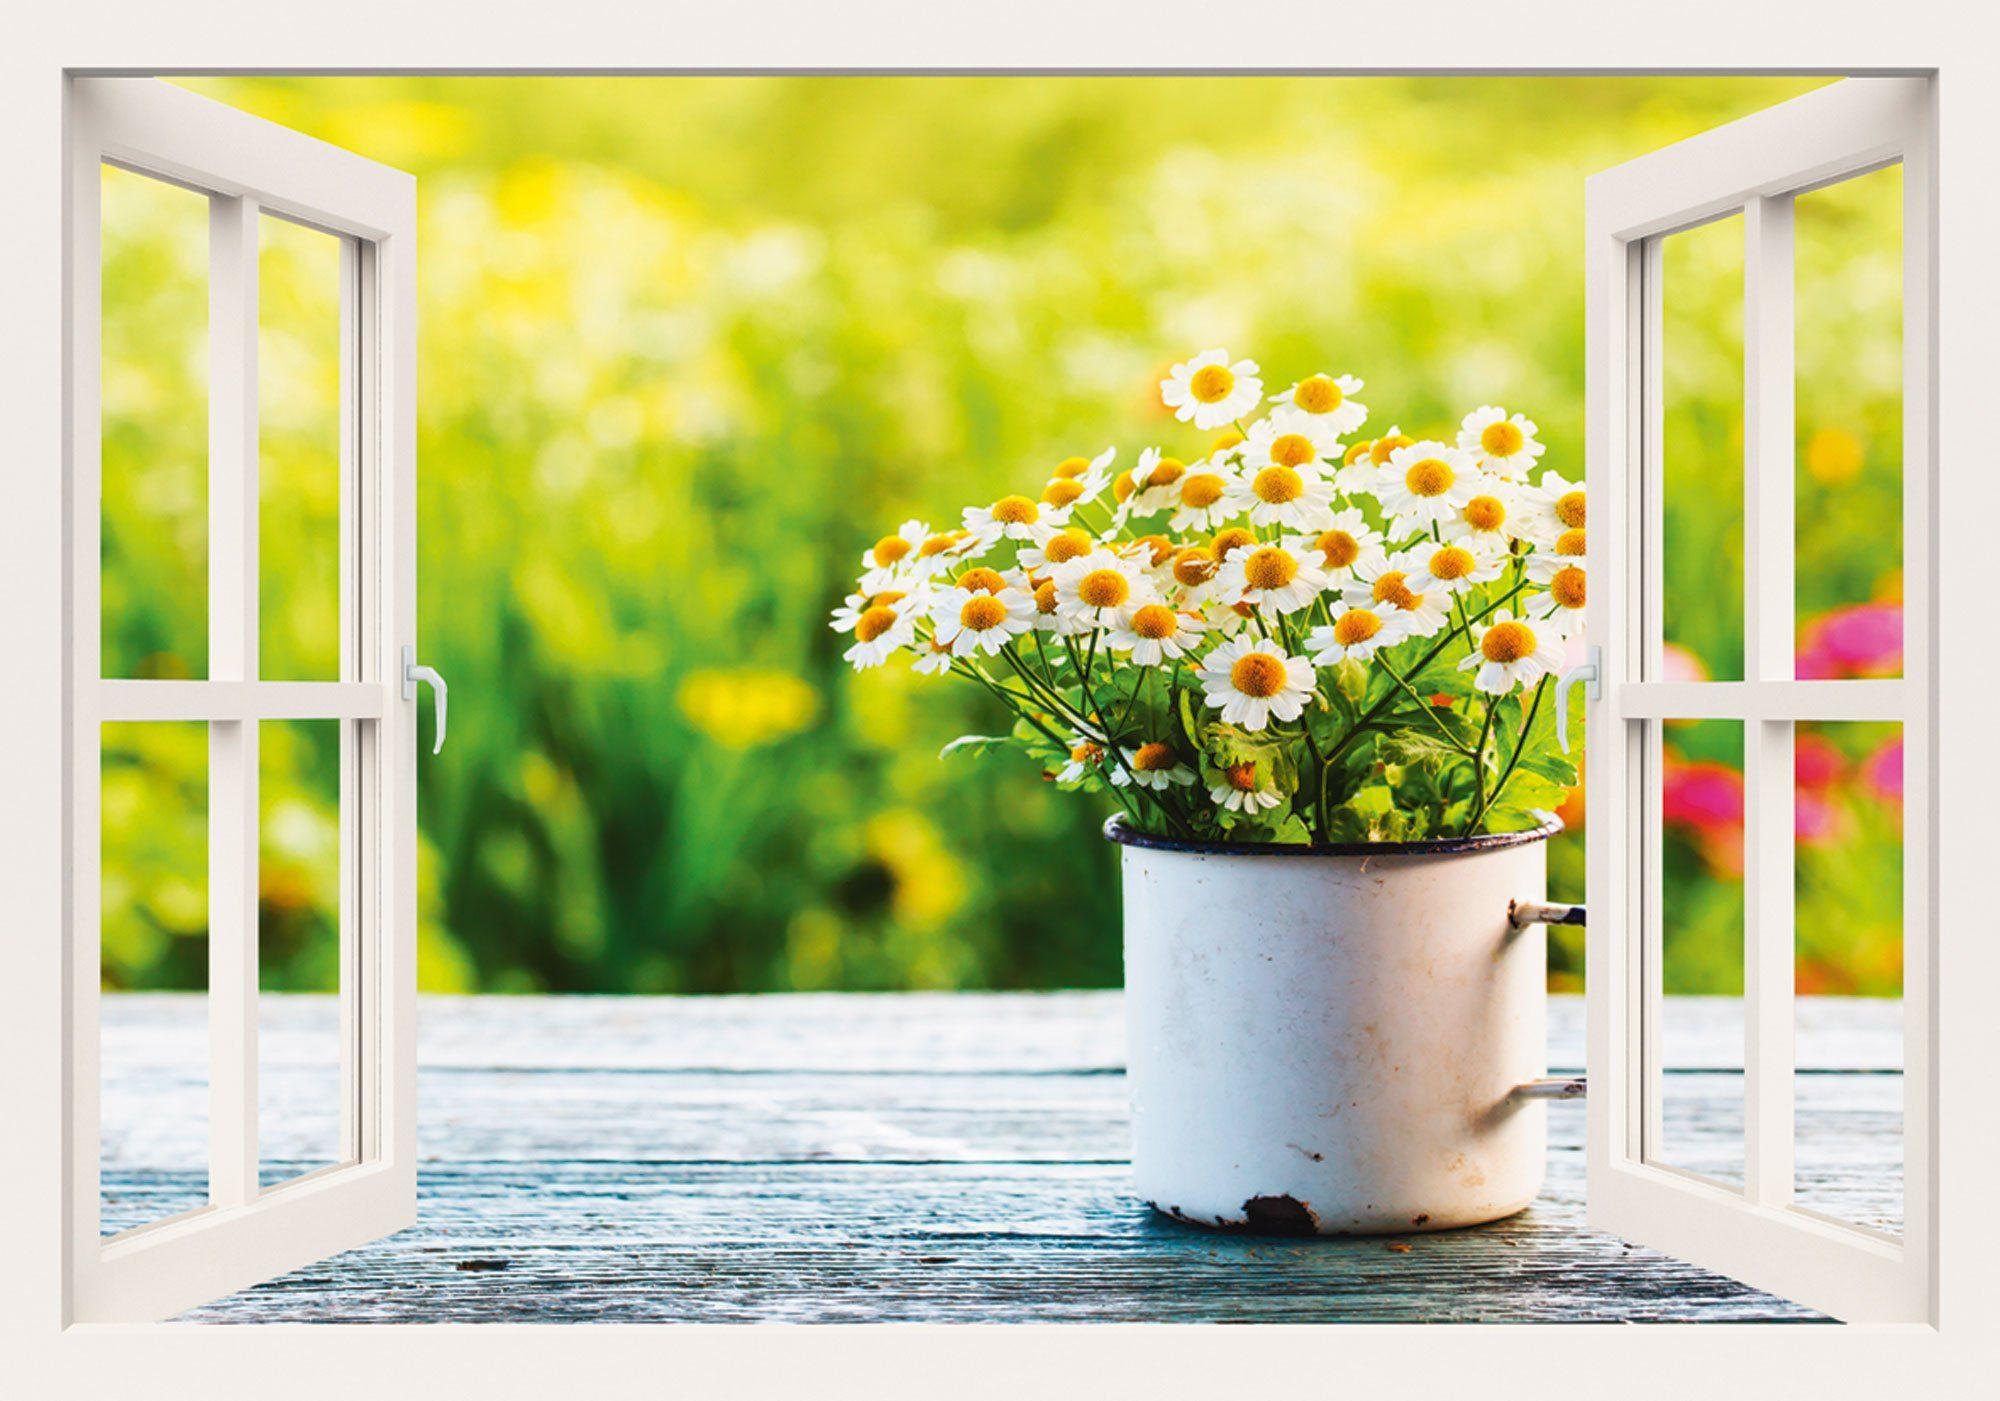 heine home Leinwandbild Fensterblick